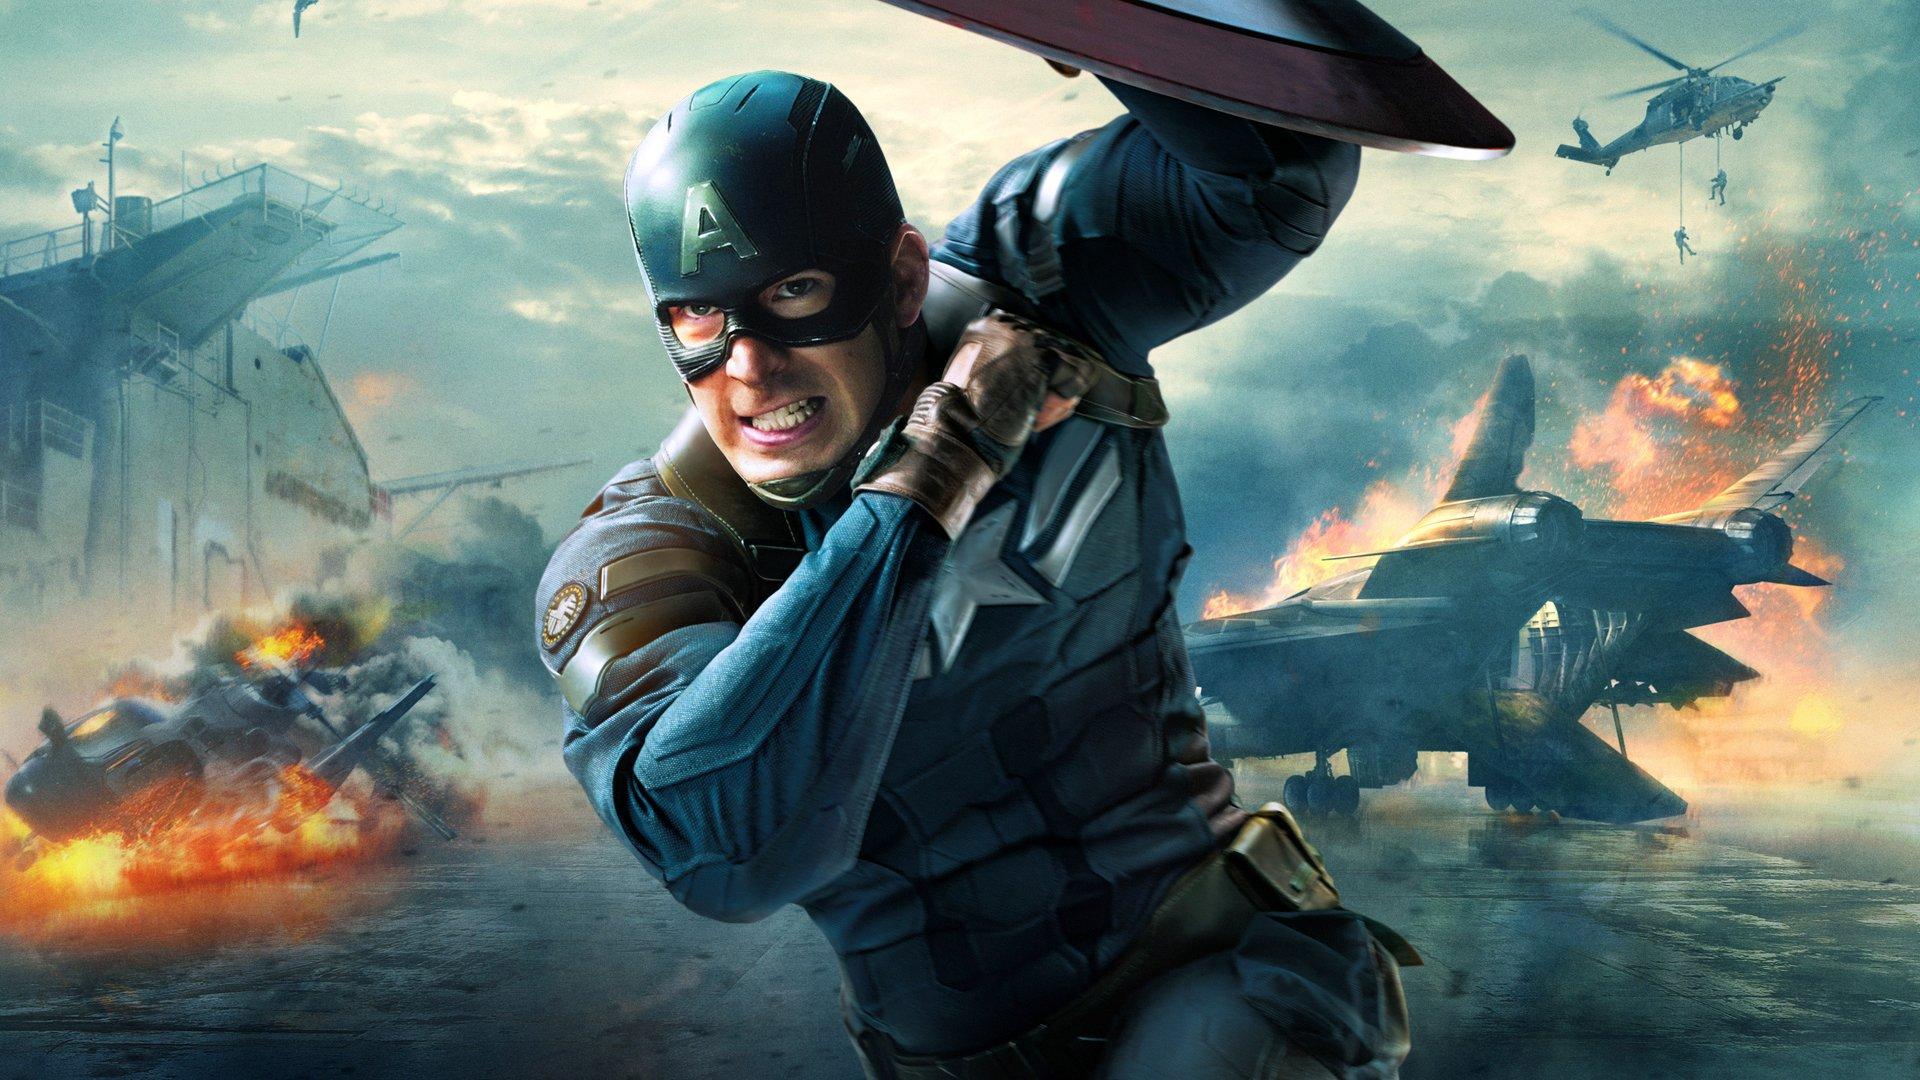 Superhero Movie Movie Wallpapers WallpapersIn4knet 1920x1080